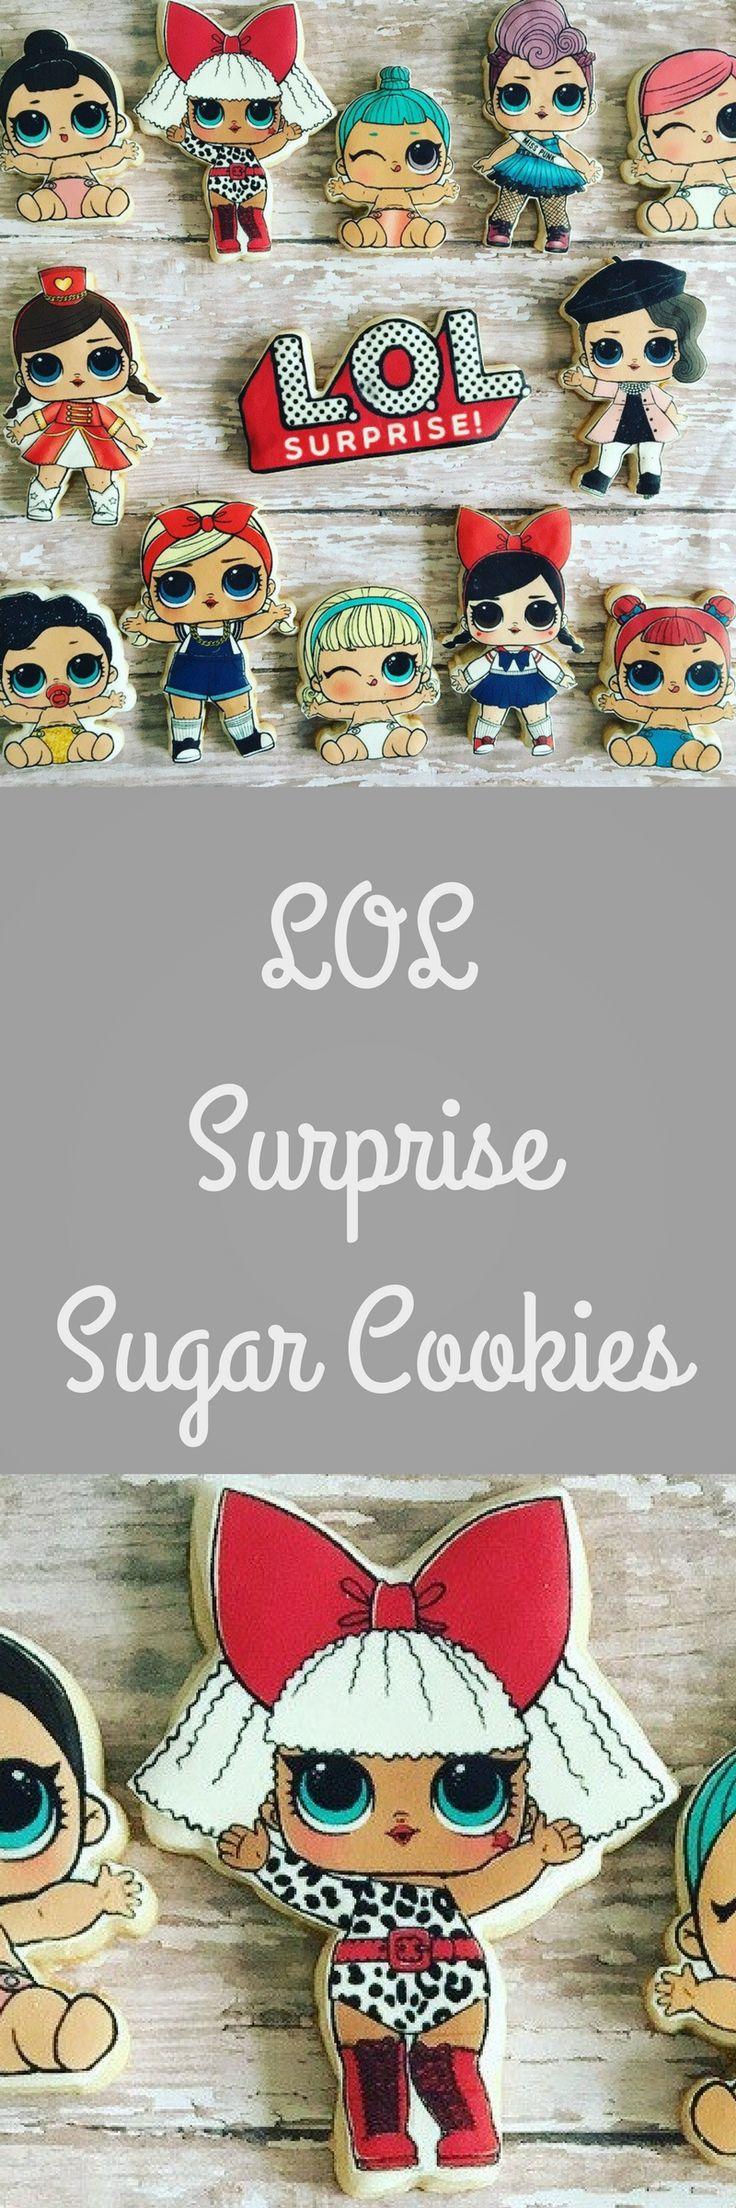 LOL surprise sugar cookies #affiliate